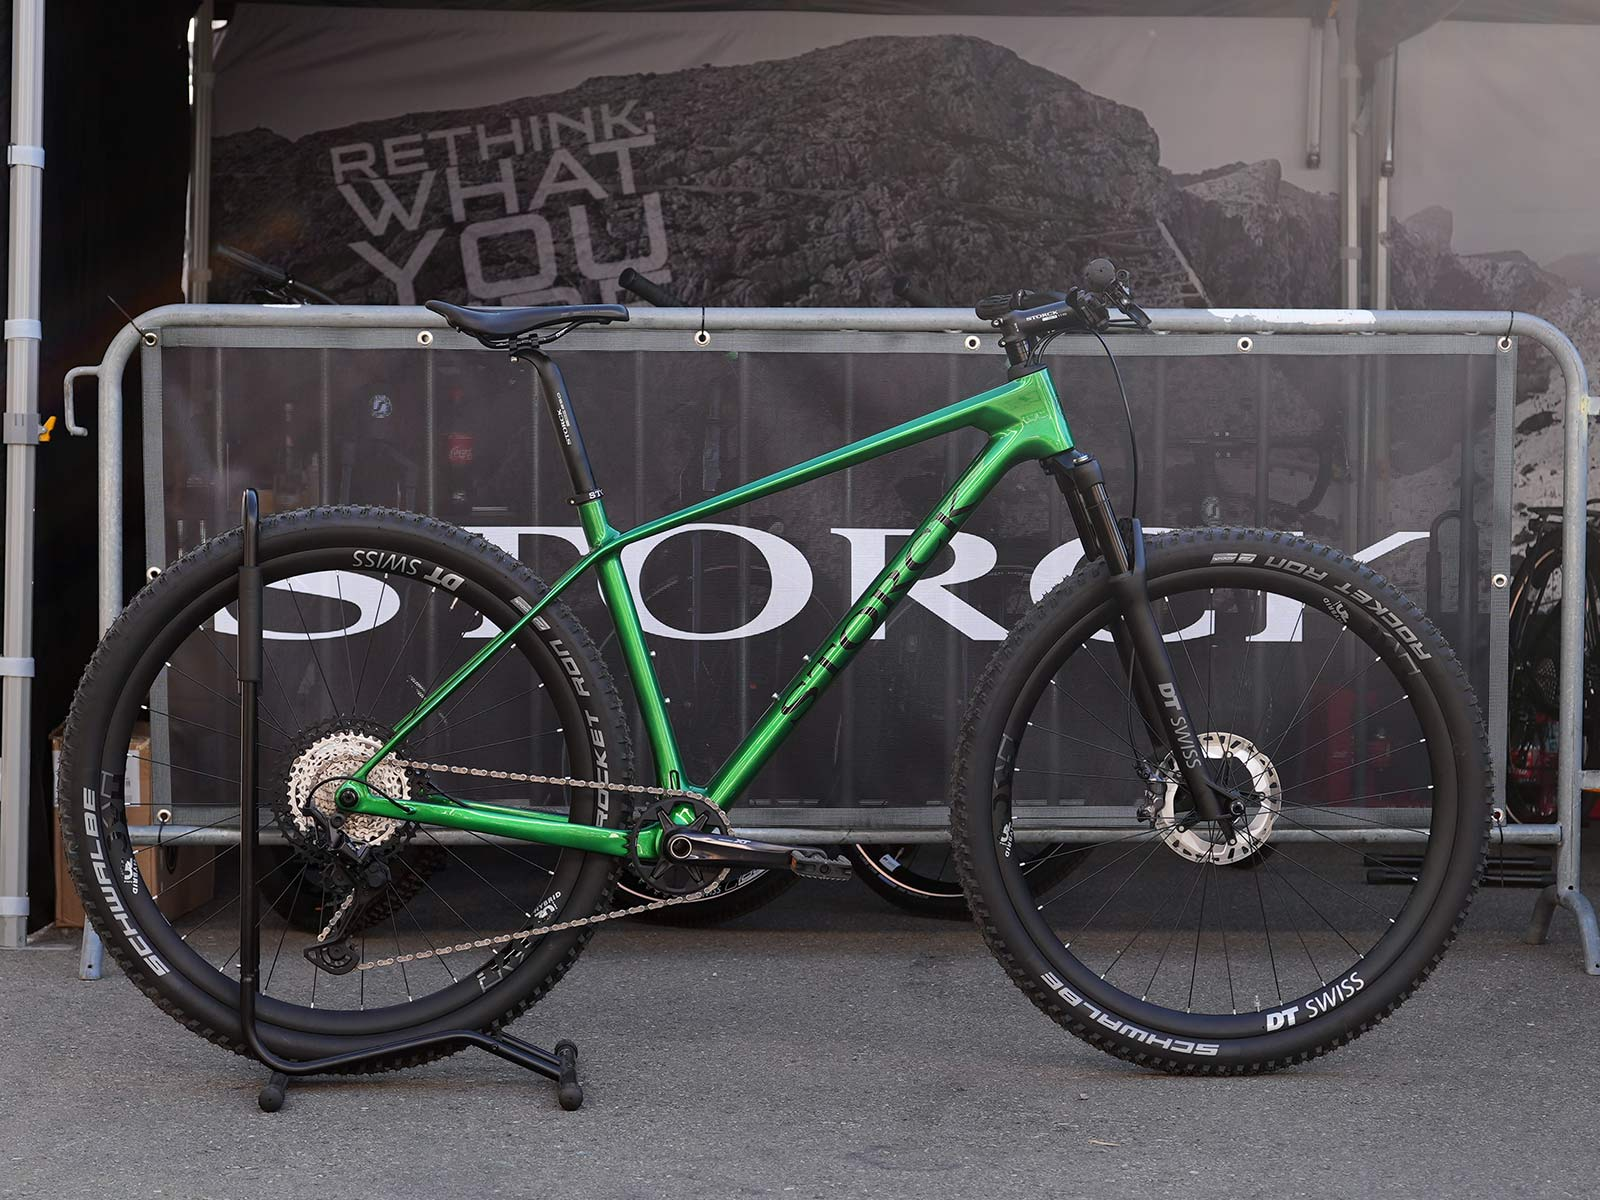 2022 stork rebel 4 lightweight carbon hardtail mountain bike